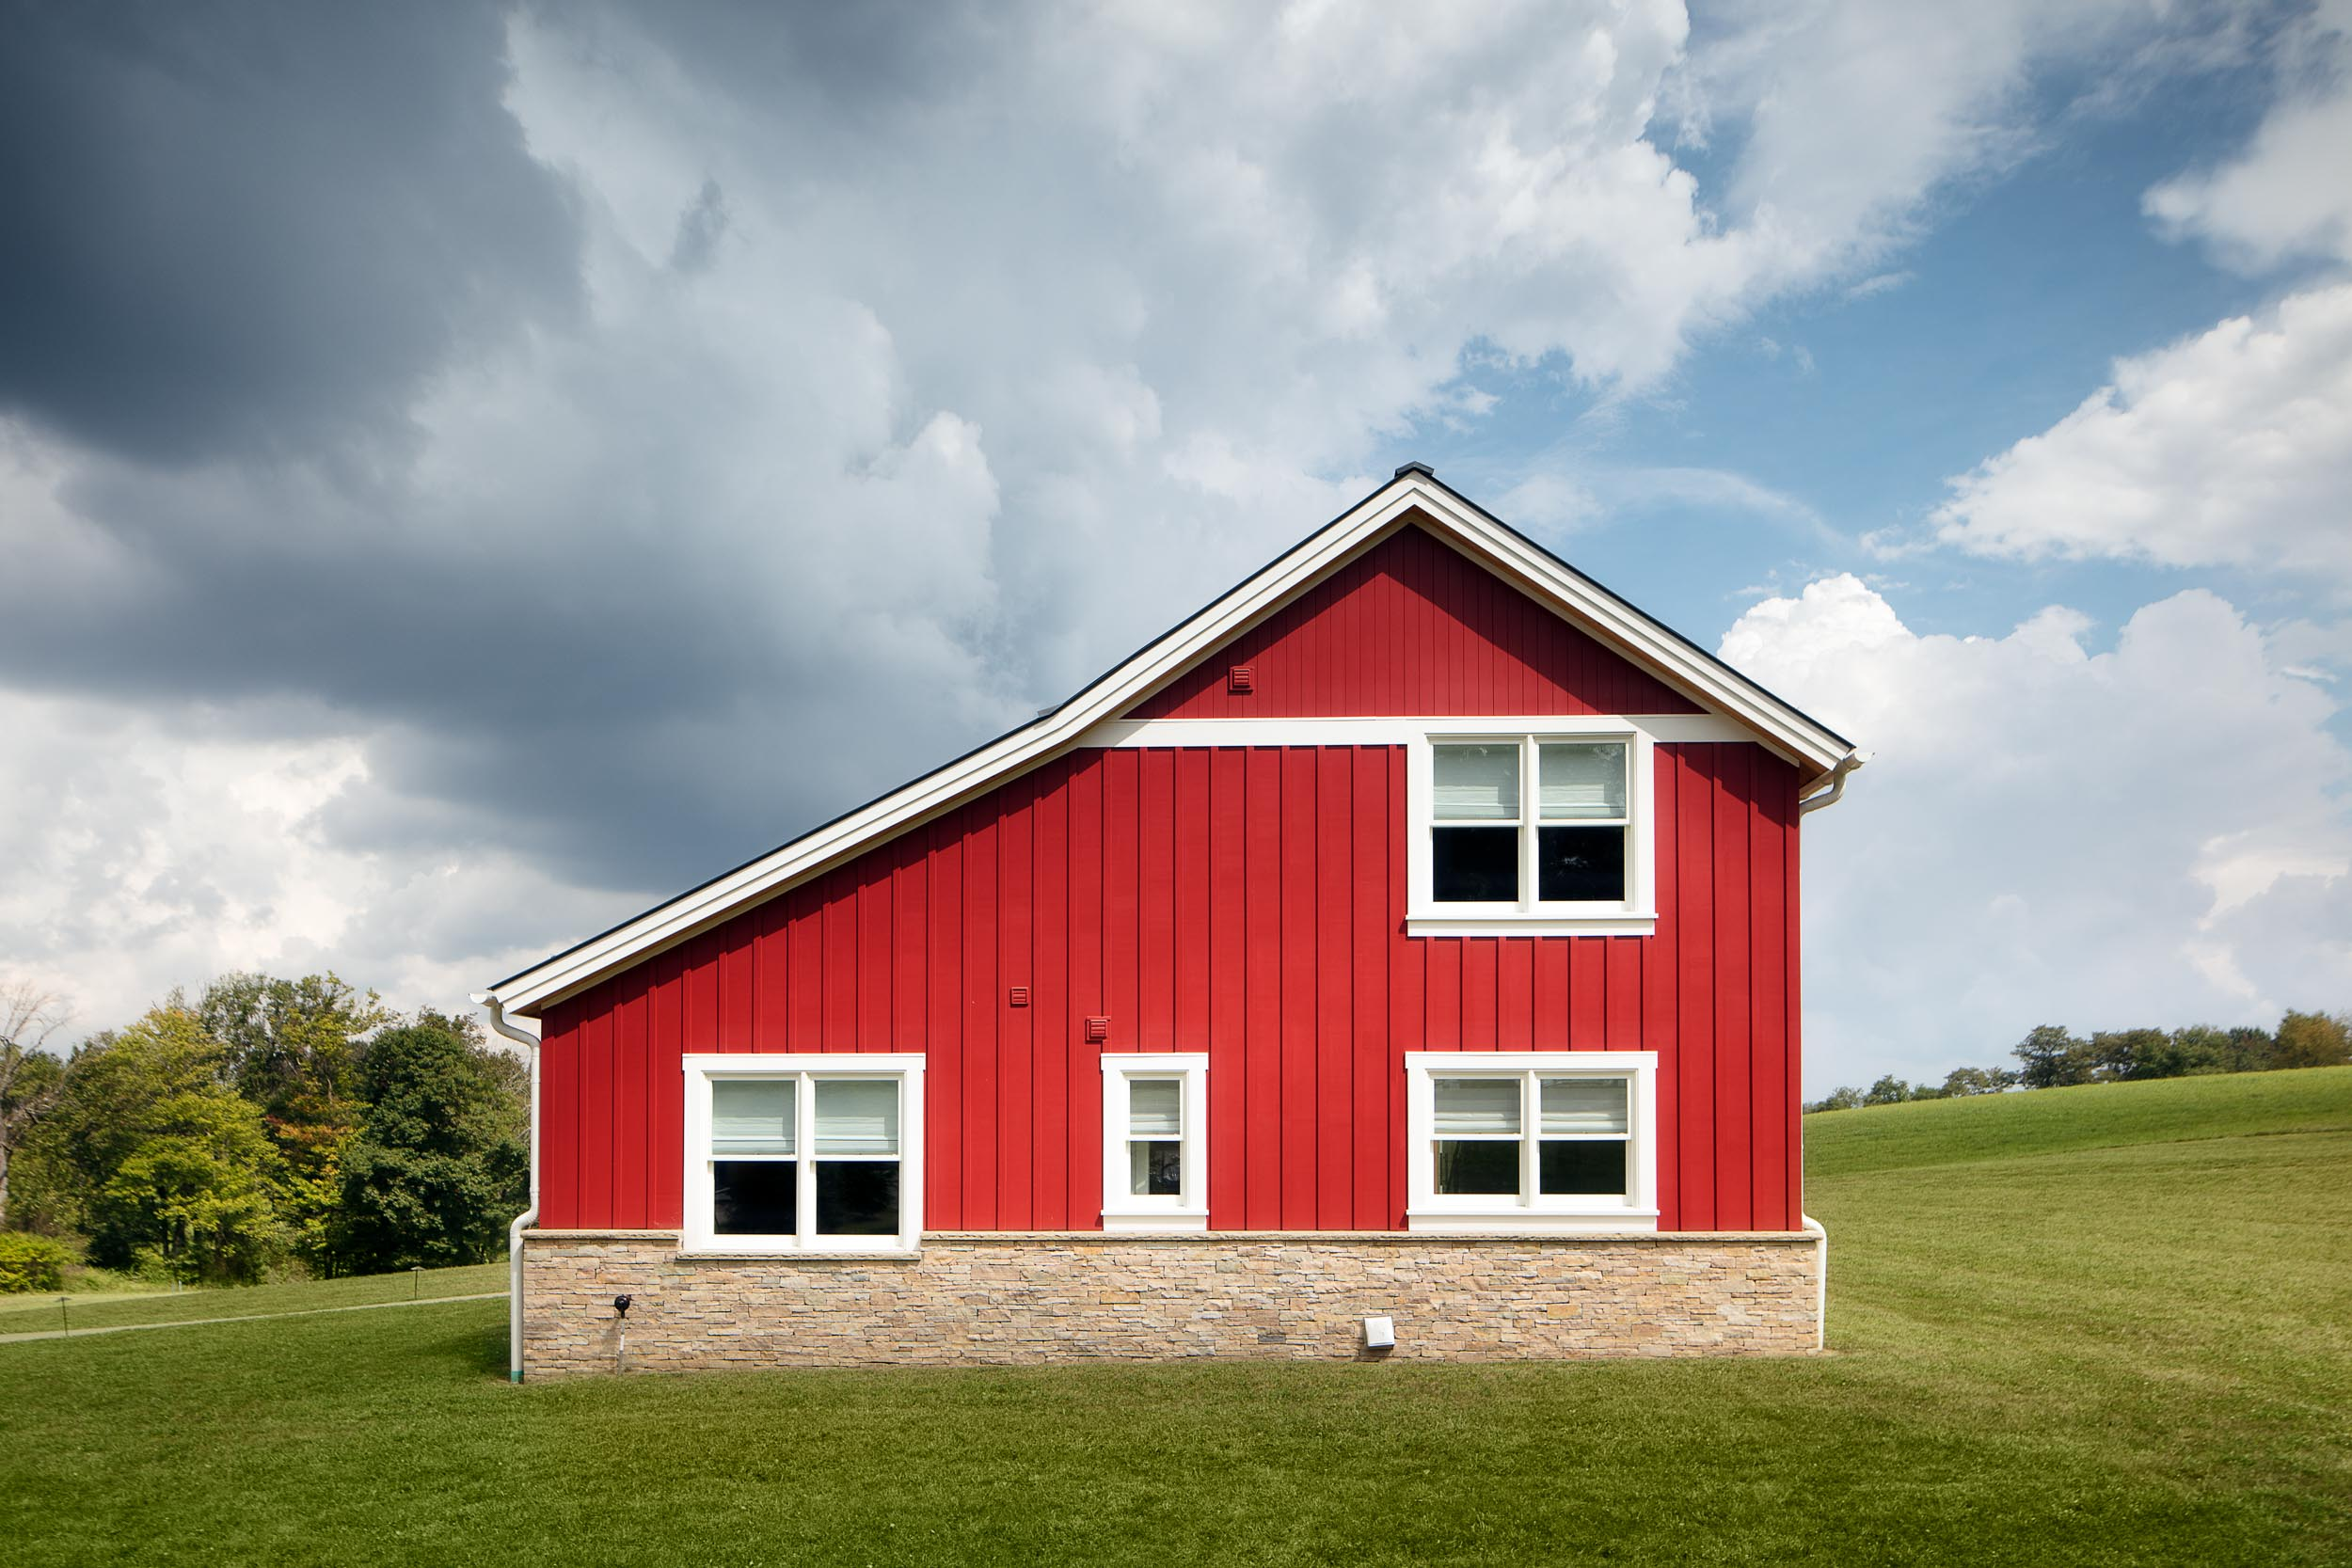 home_barn_upscale_country_grealish-11.jpg